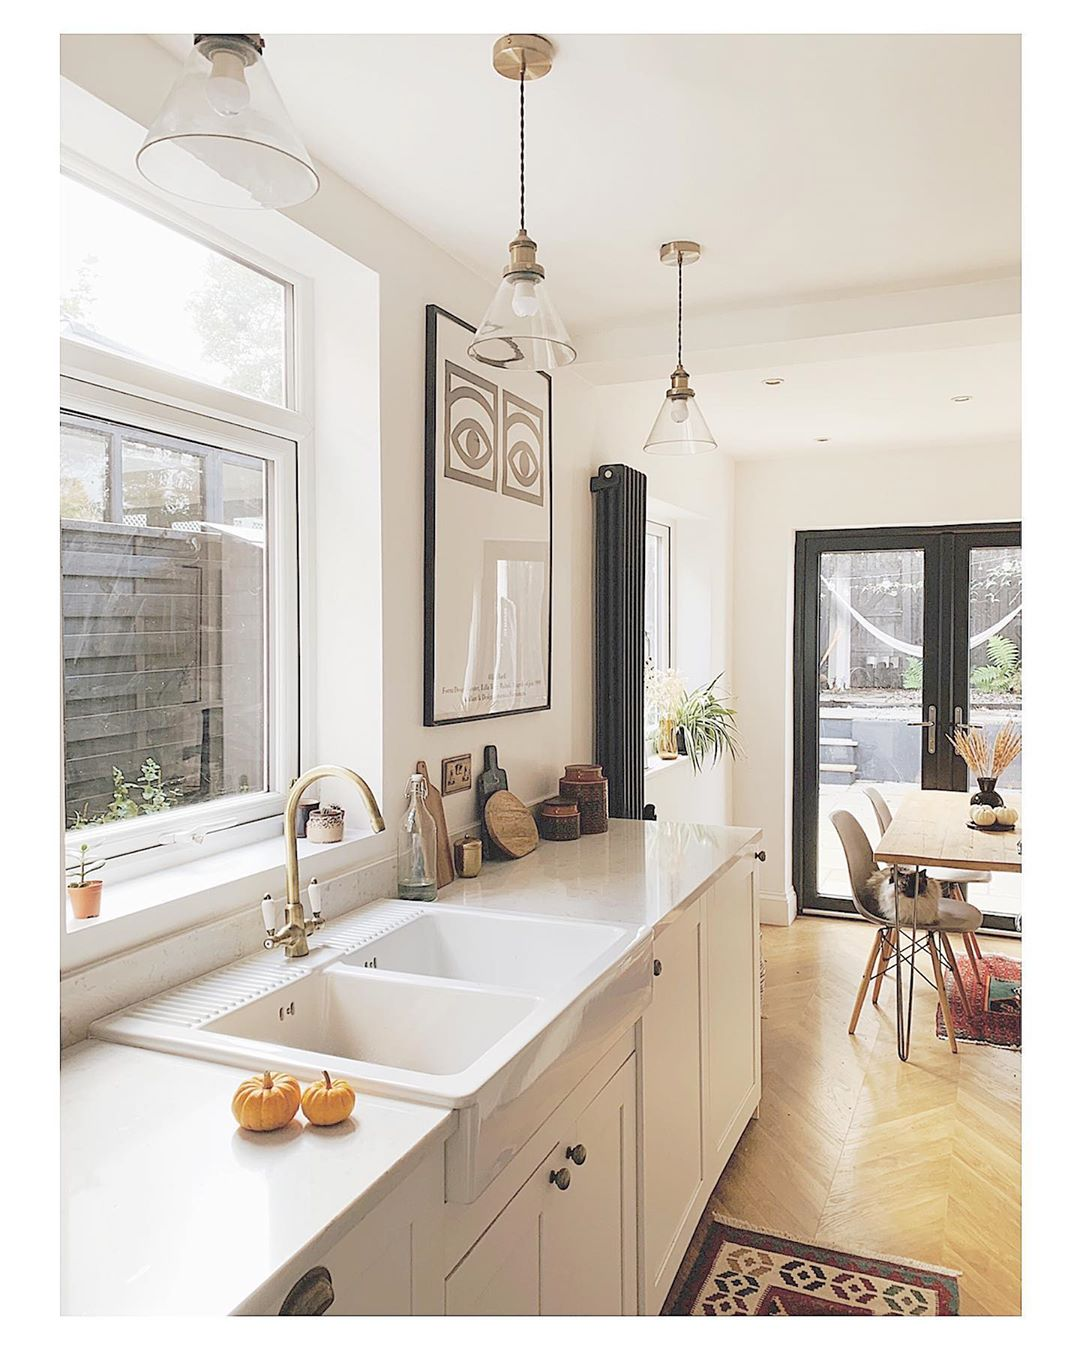 anthracite vertical radiator in a white kitchen